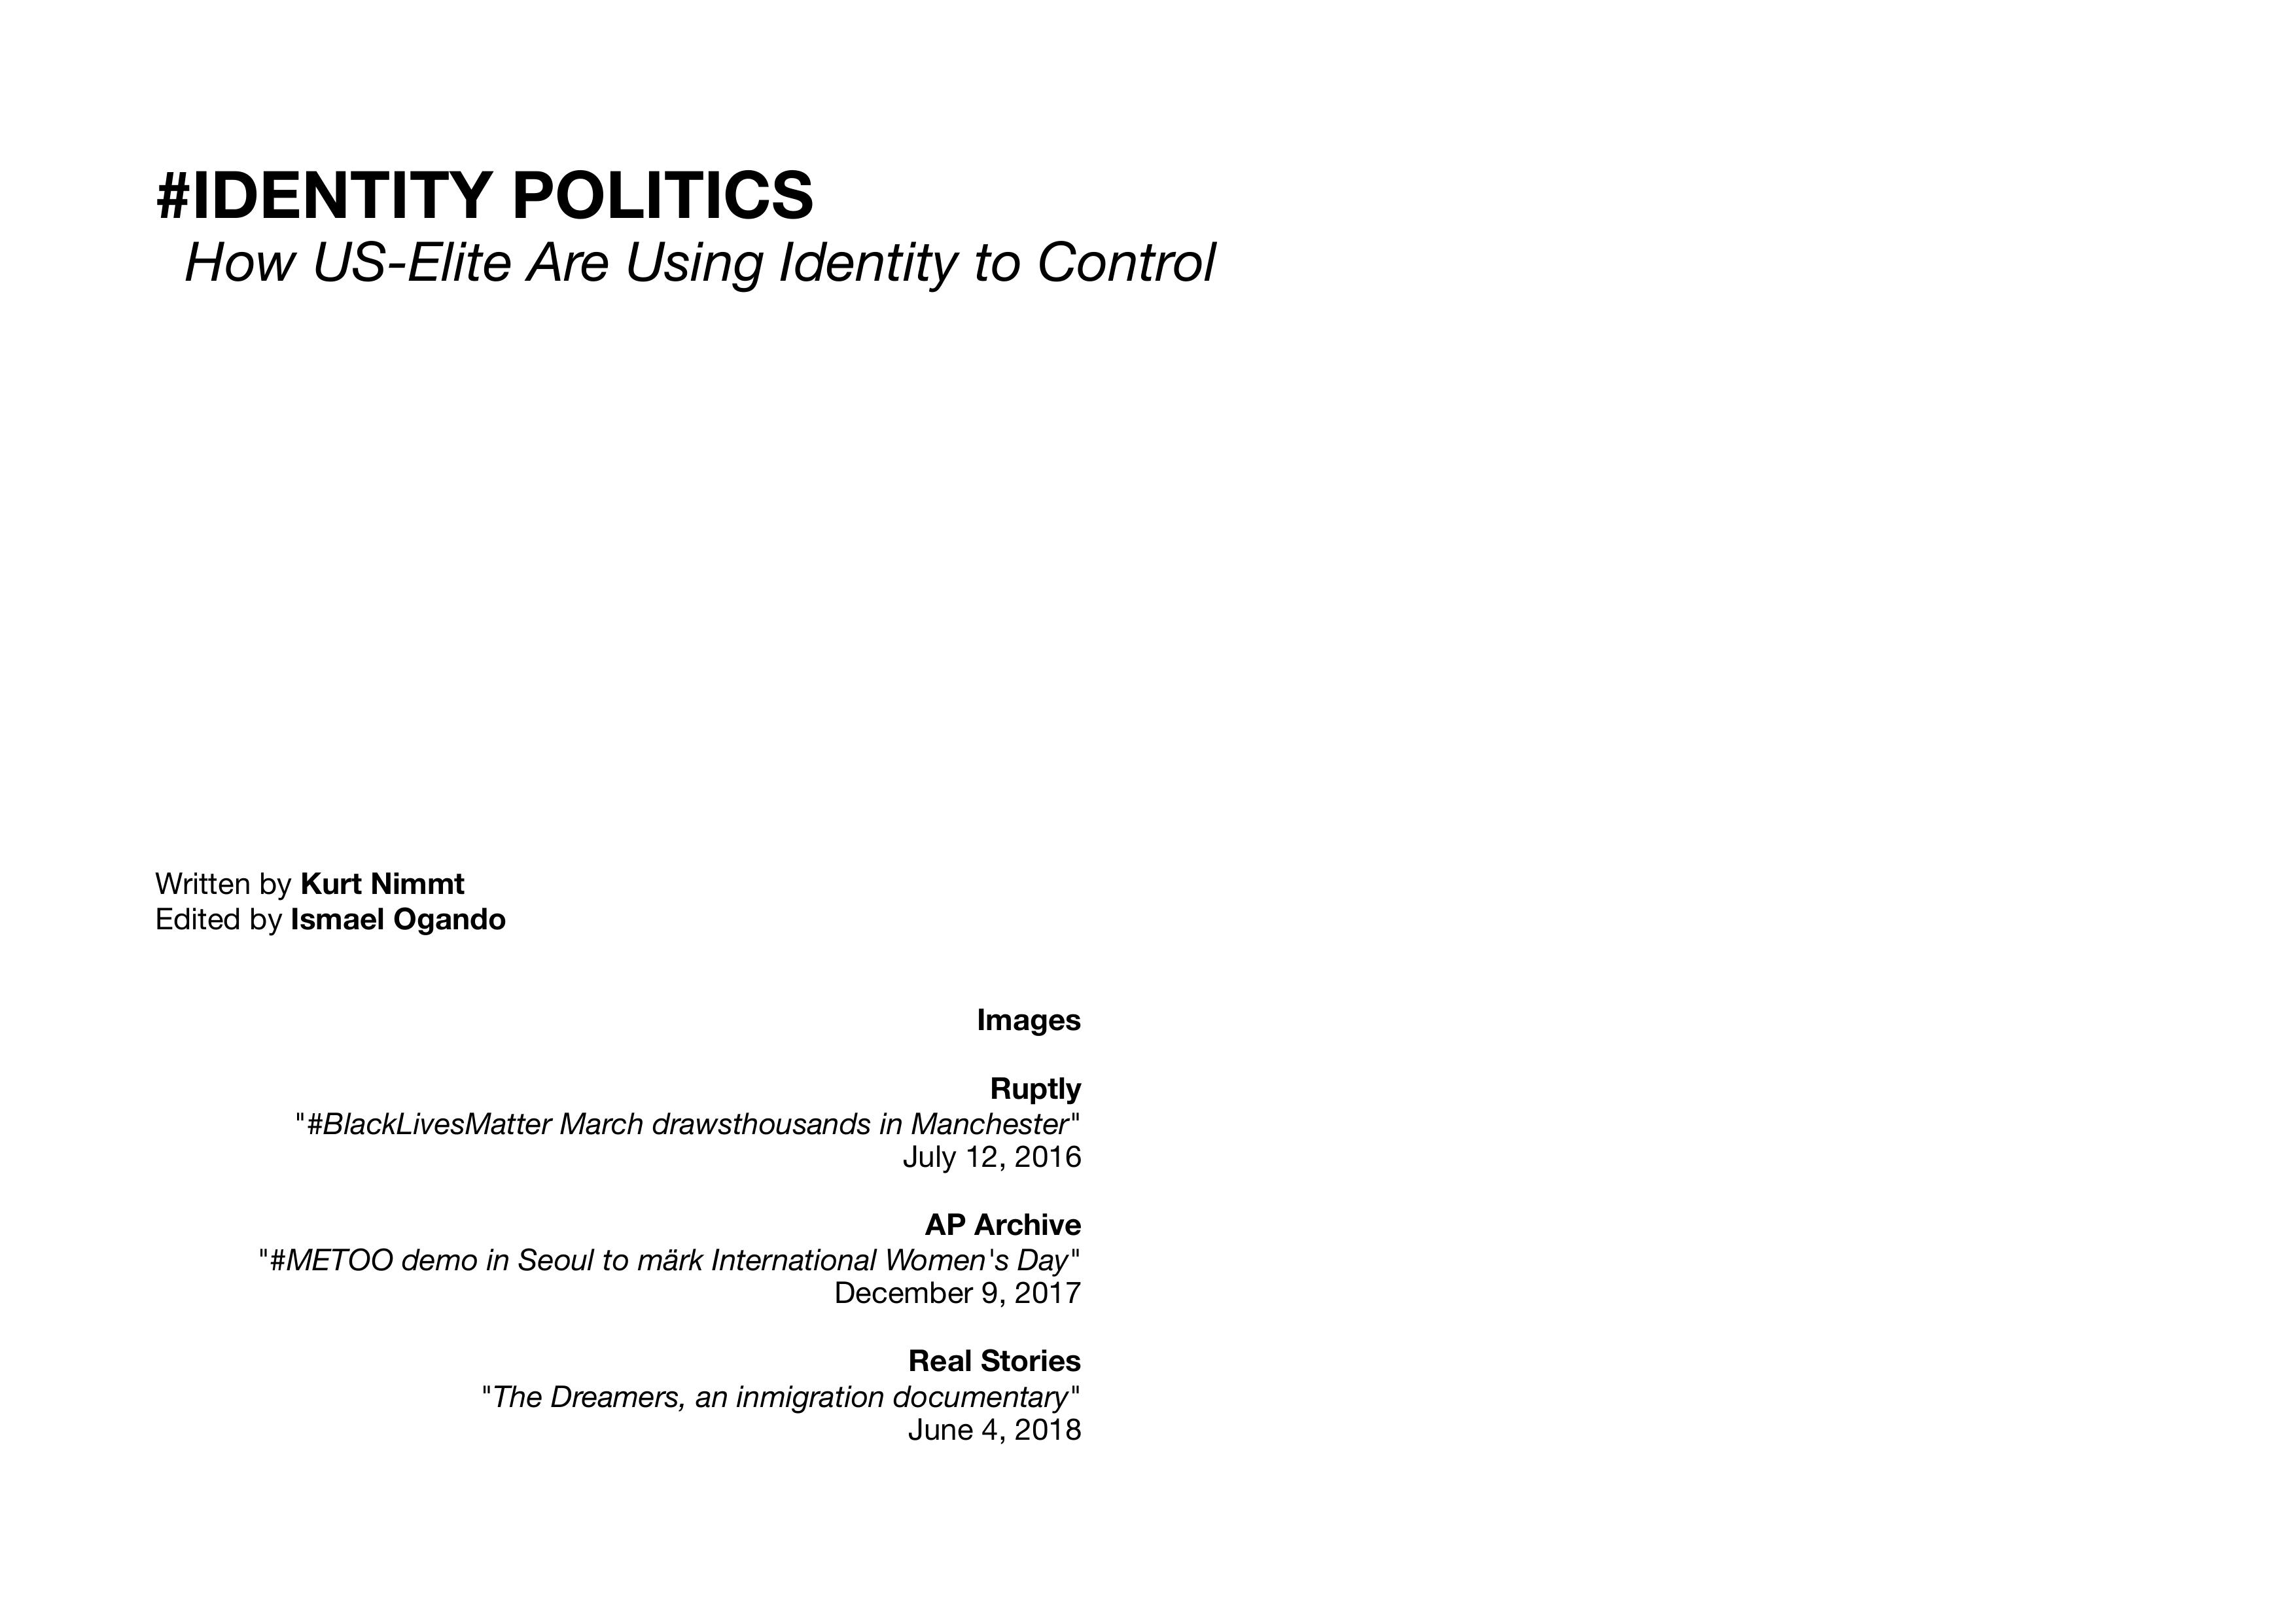 https://i.ibb.co/NCX9WKt/Identity-Politics-How-US-Elite-are-Using-Identity-to-Control-Kurt-Nimmo-Edited-by-Ismael-GROUND-September-2019